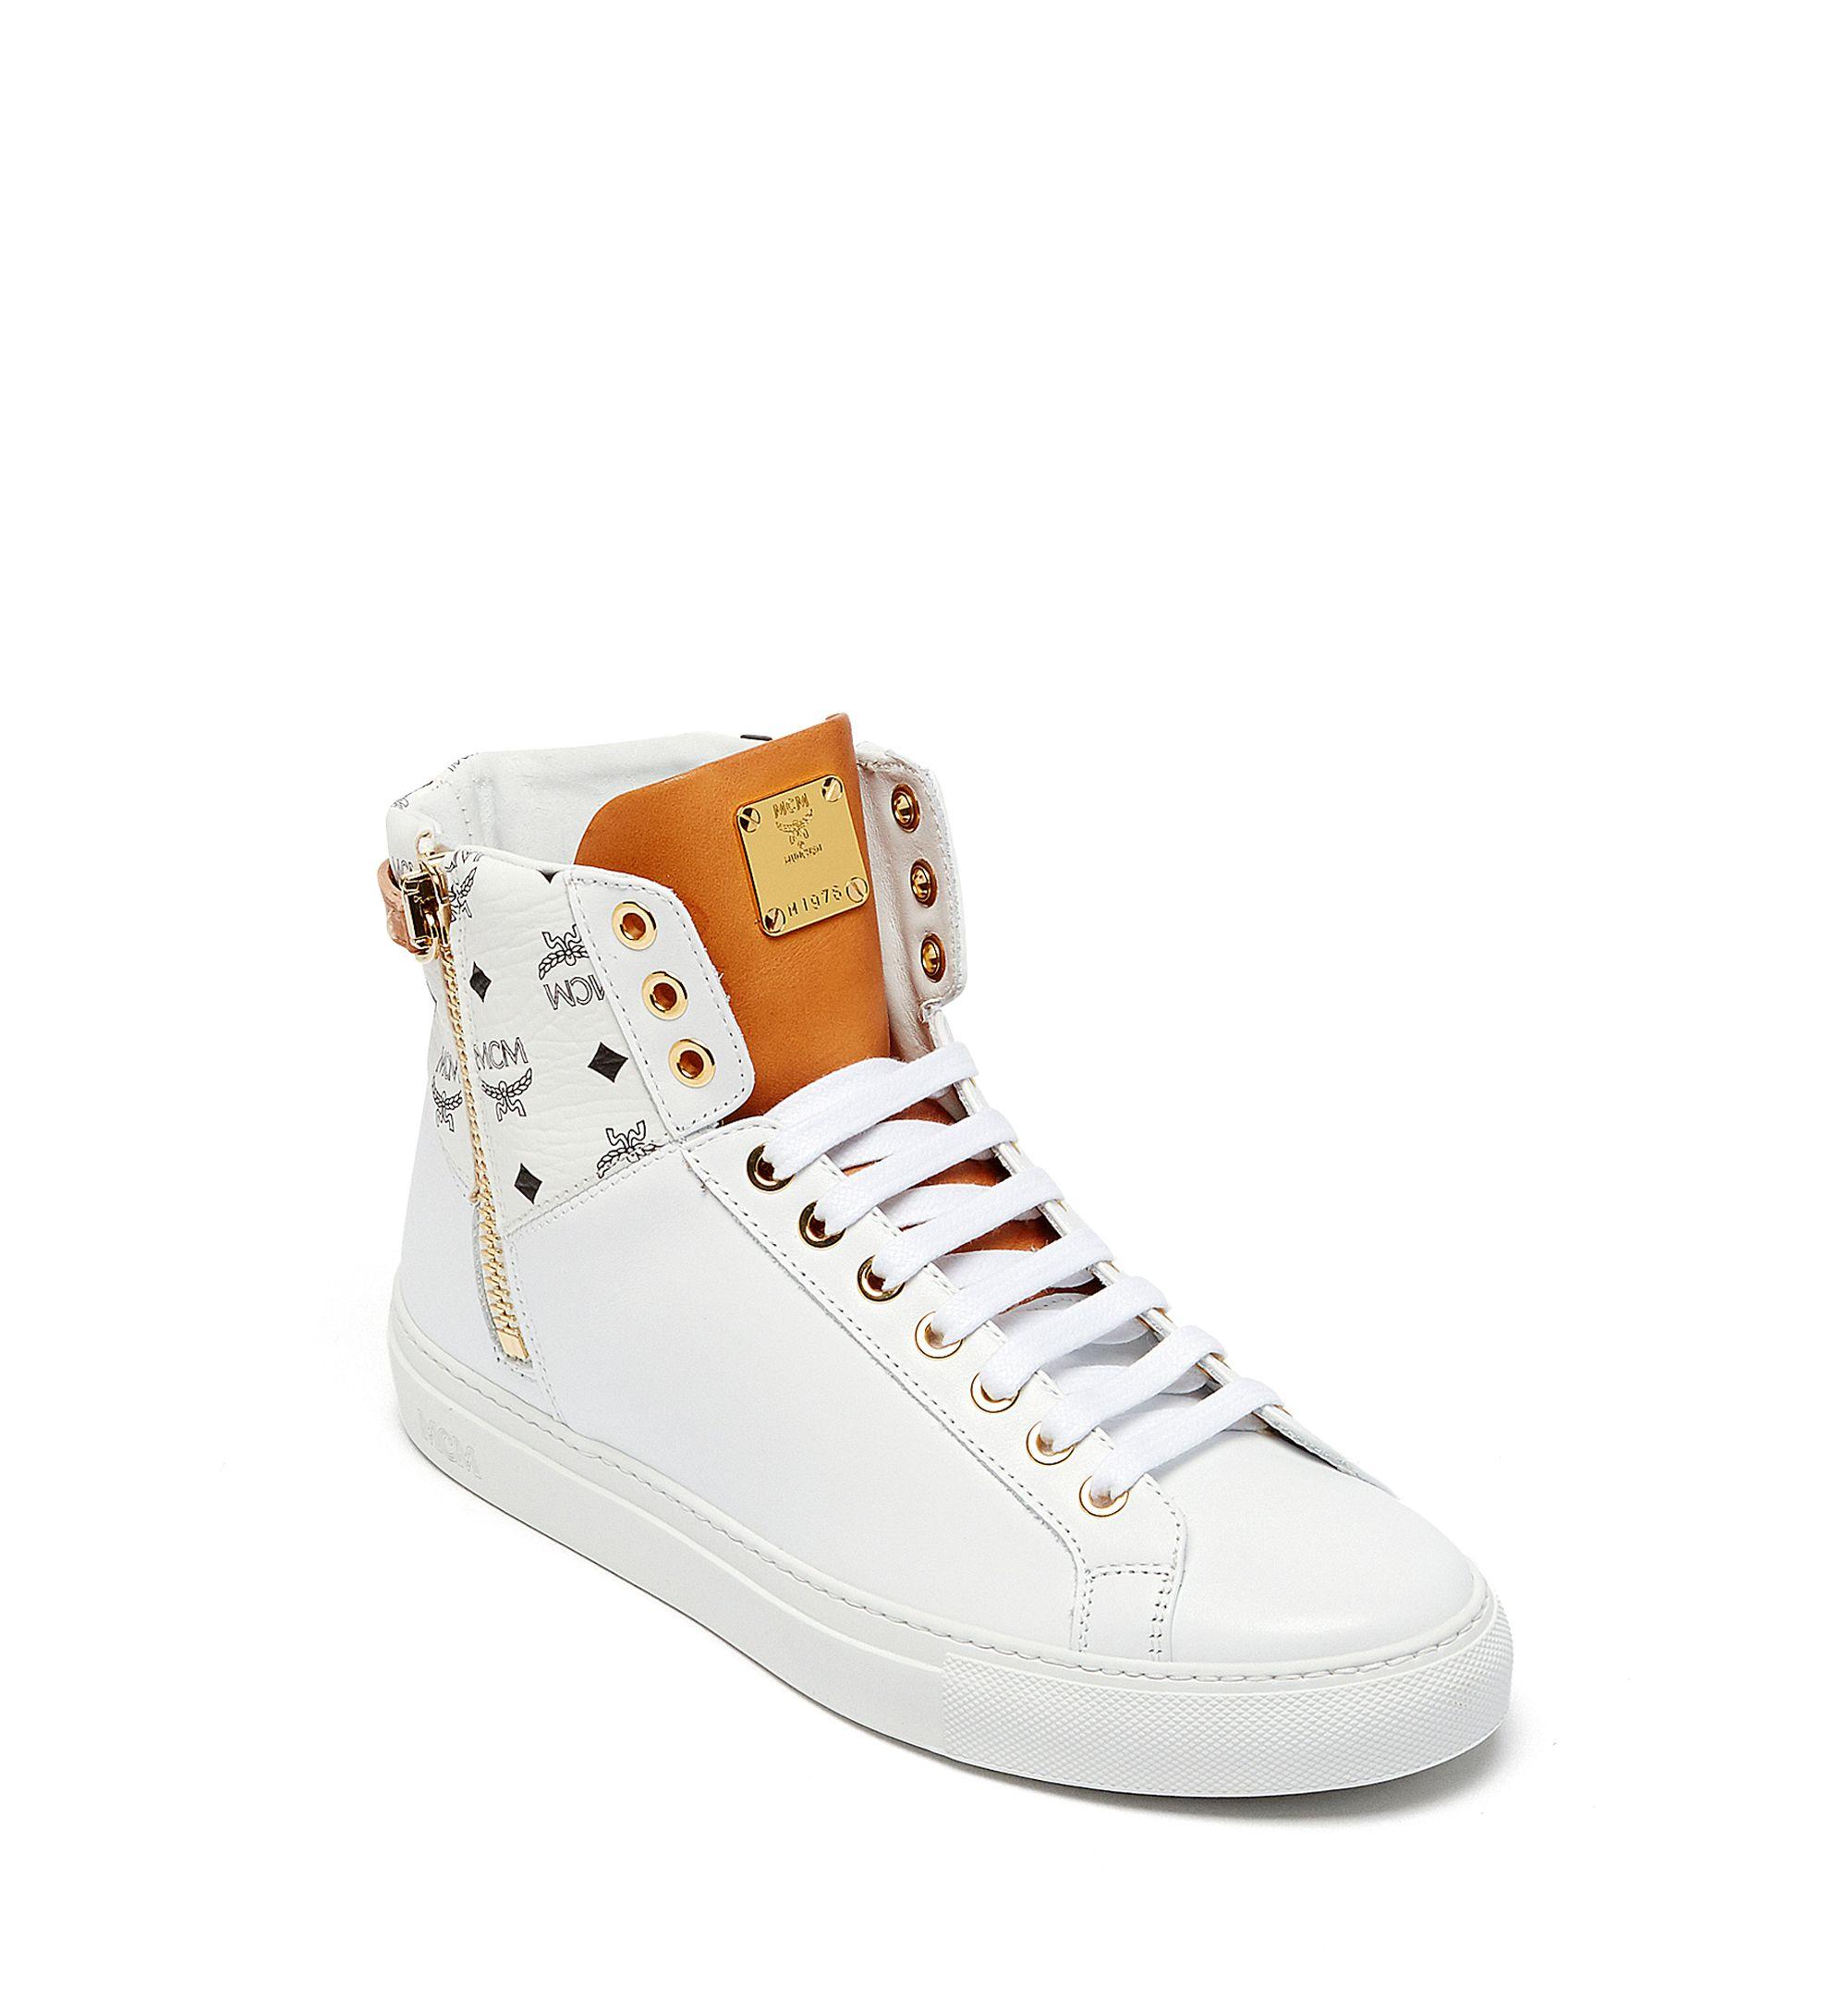 8c7d303a3e4 MCM WOMEN S VISETOS ZIP HIGH TOP SNEAKERS.  mcm  shoes